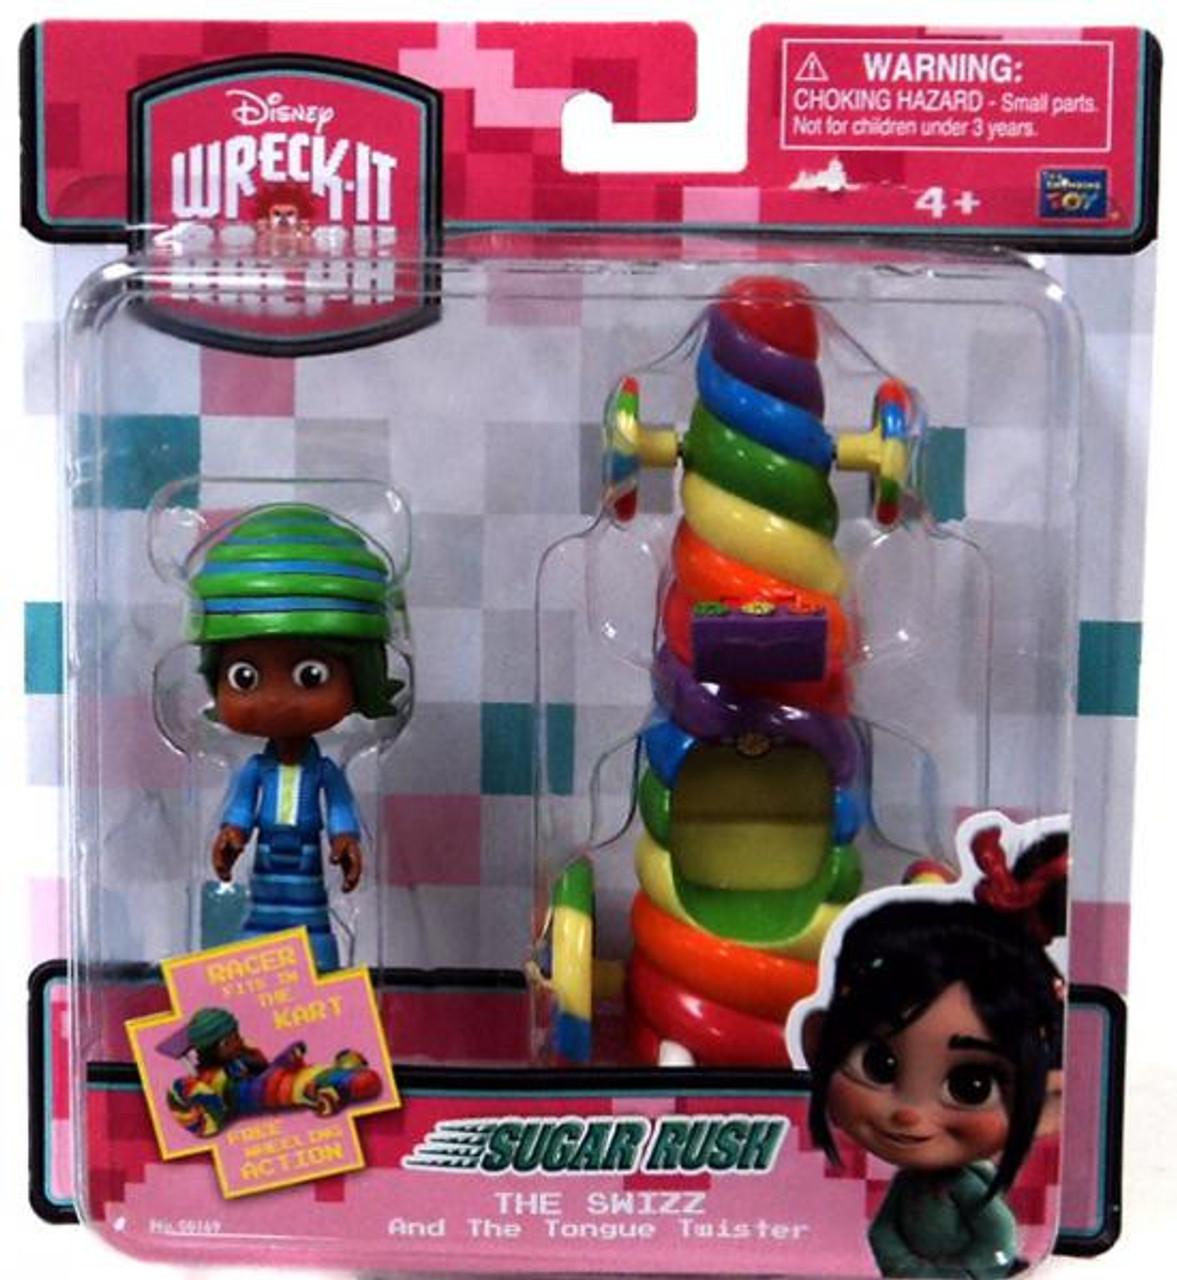 Disney Wreck-It Ralph Sugar Rush Racer The Swizz & Tongue Twister Figure Set